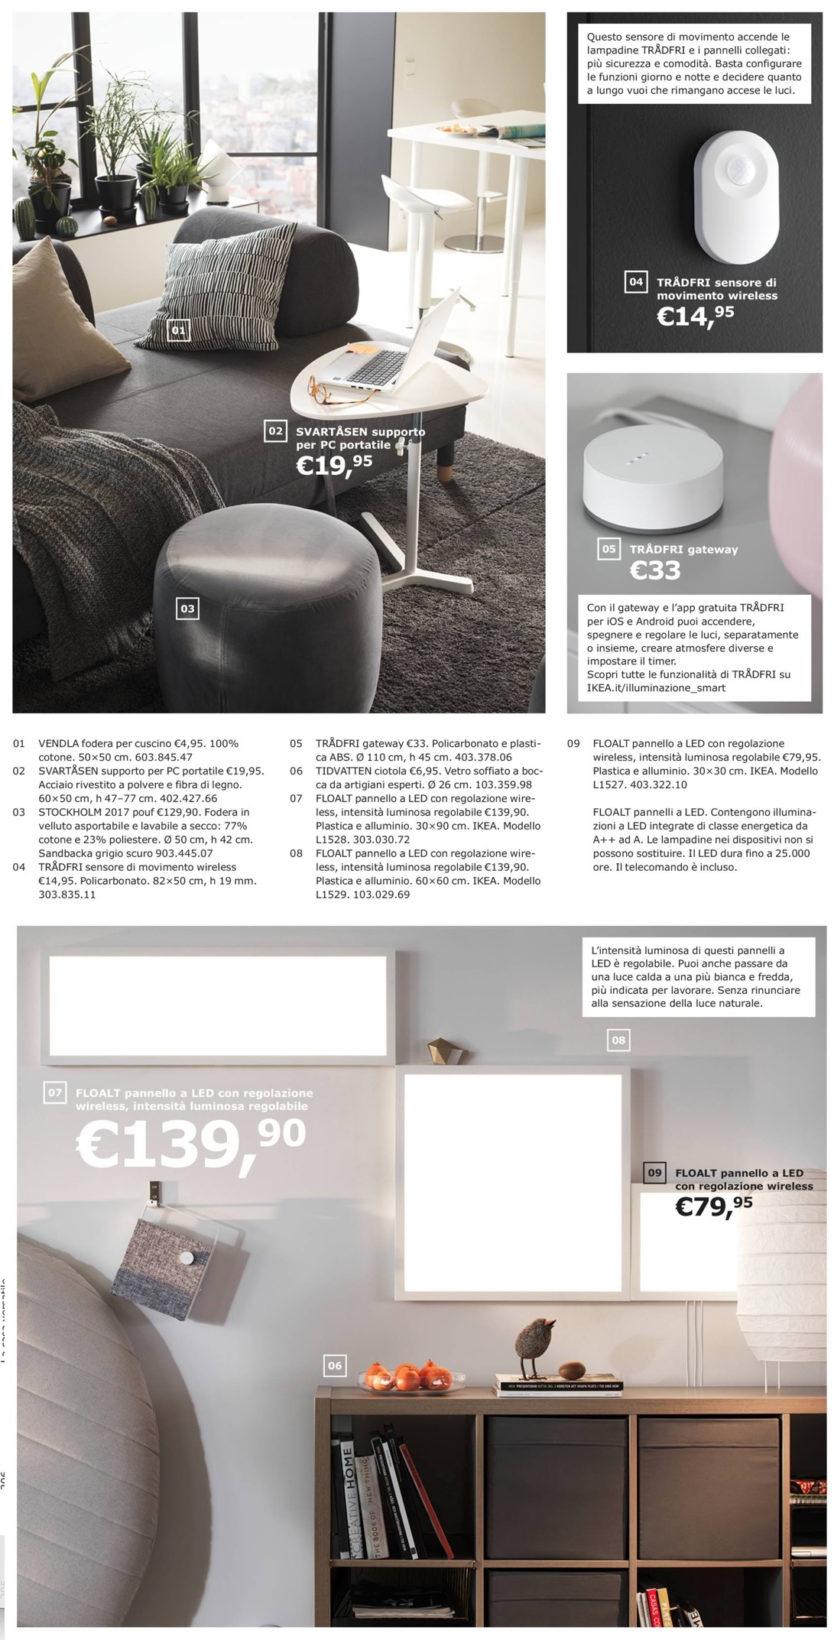 Catalogo Ikea 2019 Tra Casa Smart E Speaker Bluetooth Come